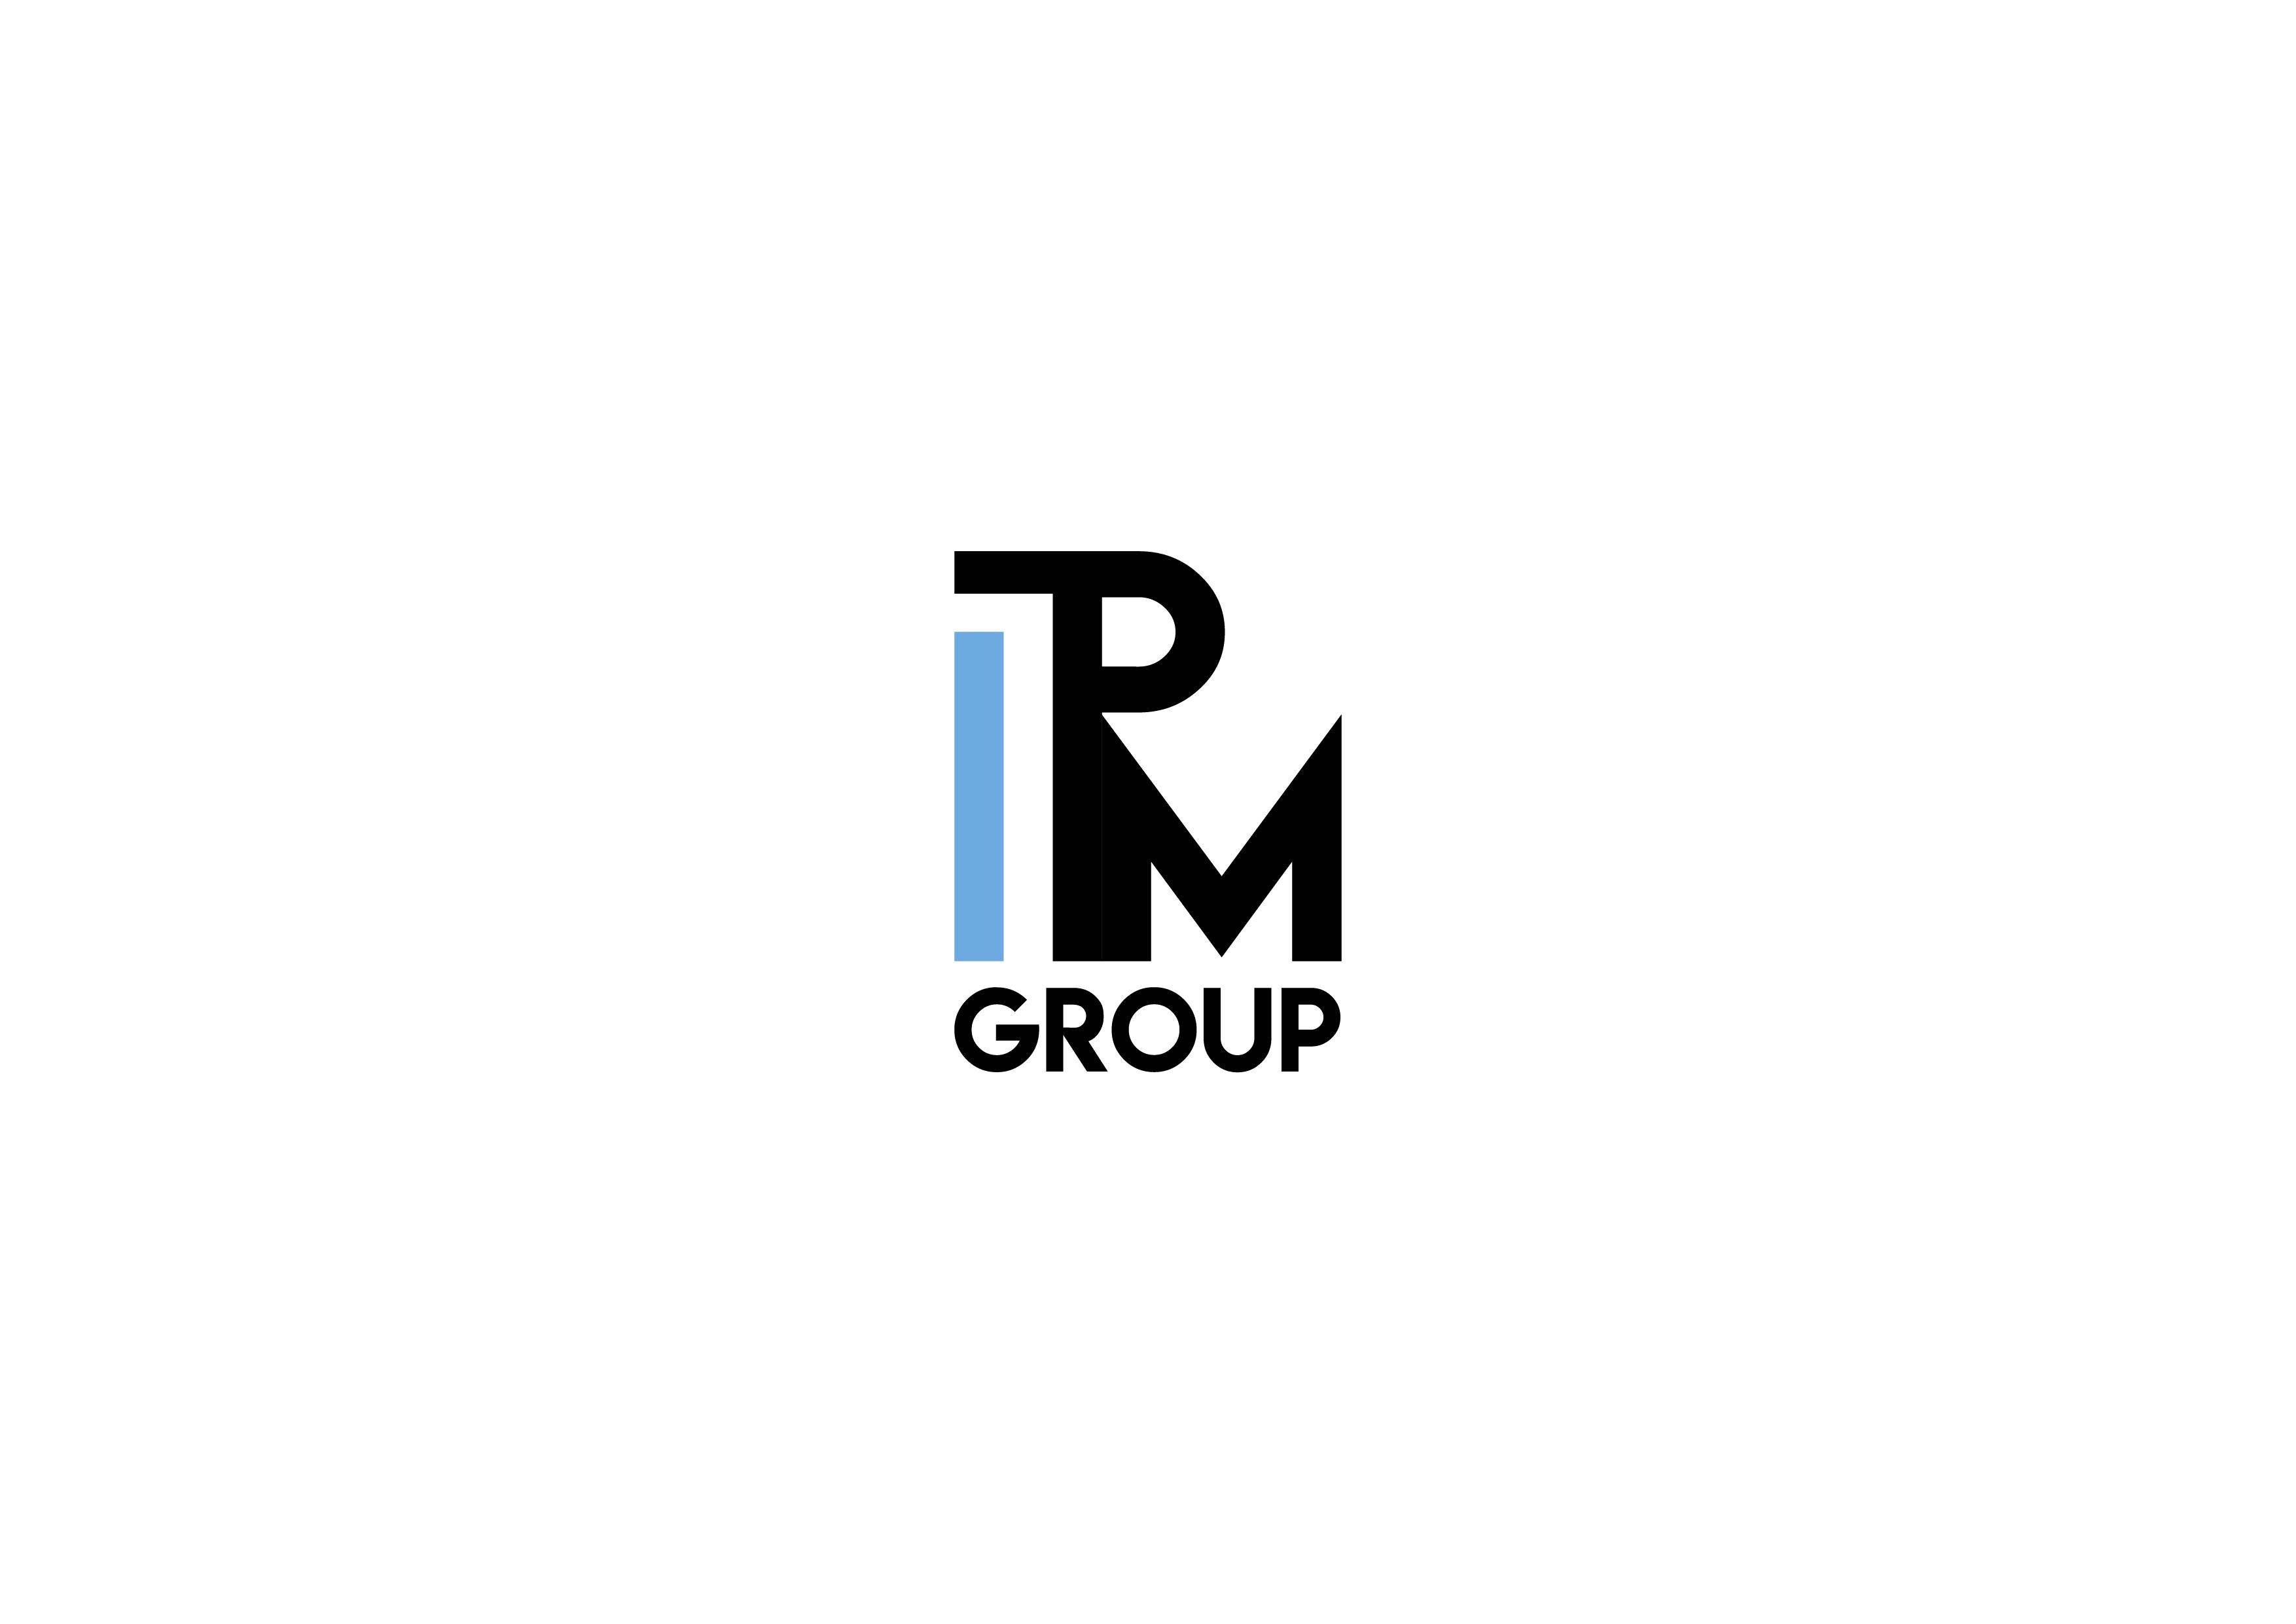 Разработка логотипа для управляющей компании фото f_1665f832a08d3299.jpg